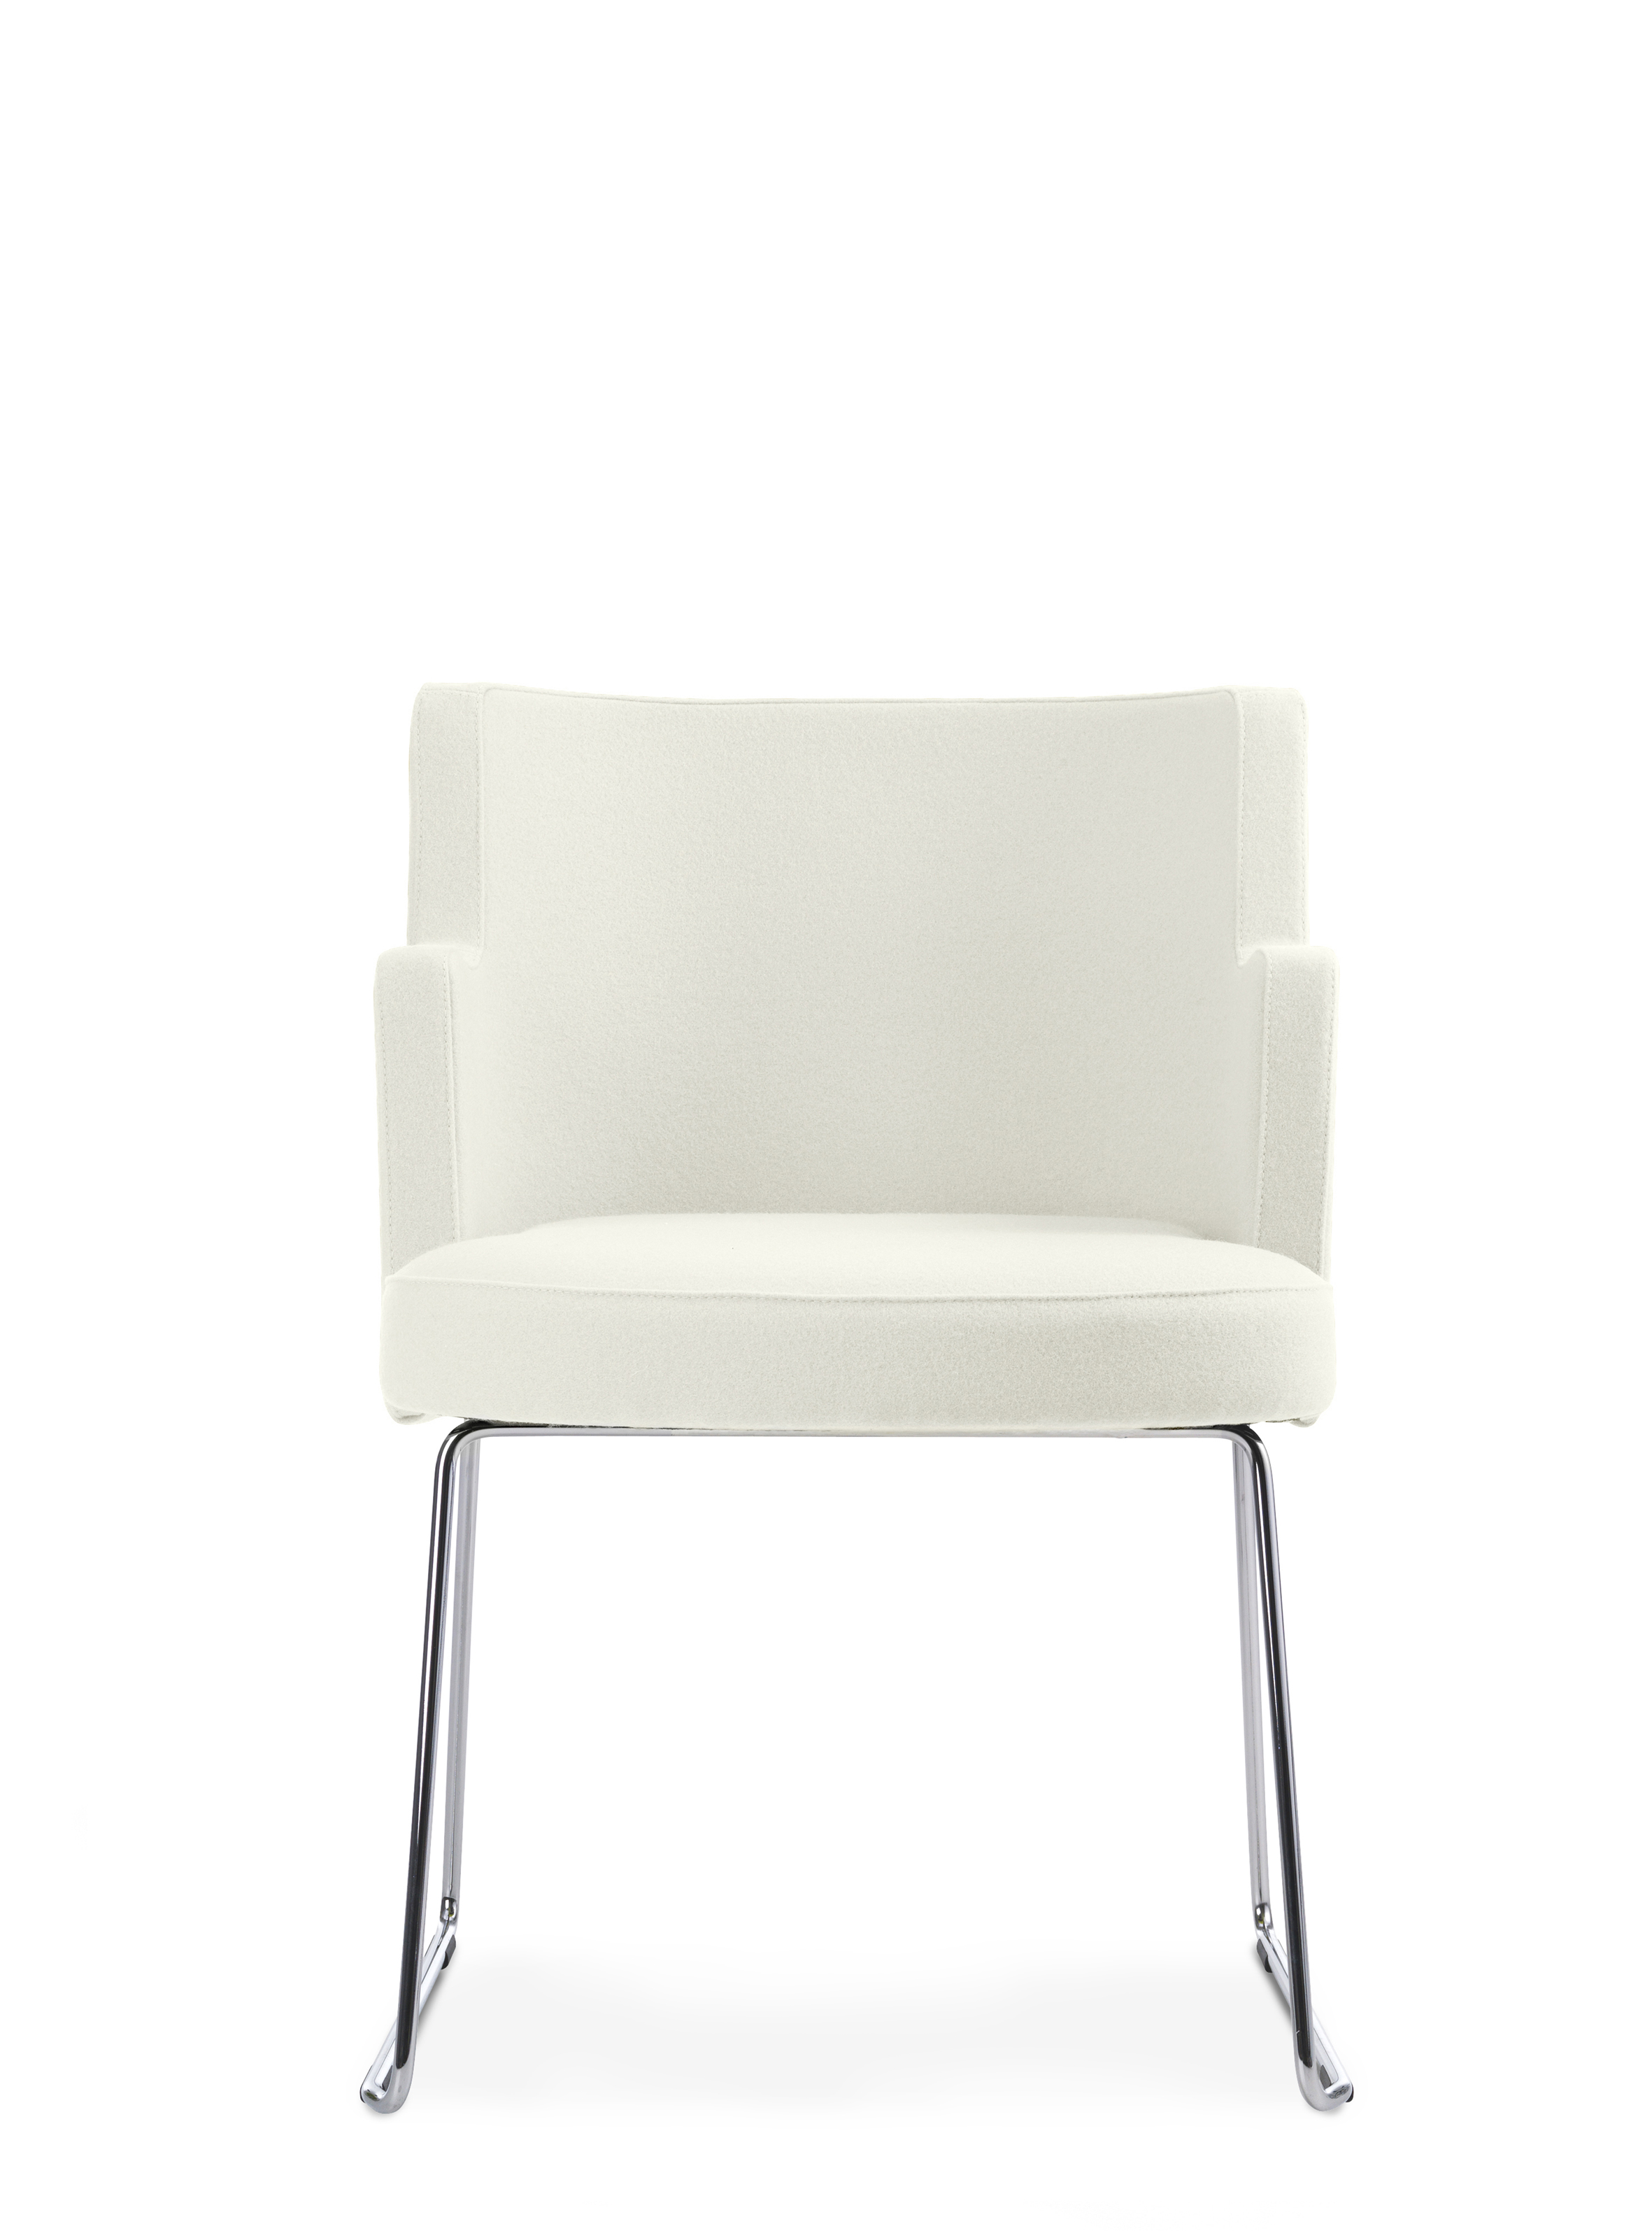 CHARLESTON elegant stol i sammet, ljusgrå sammetsstol